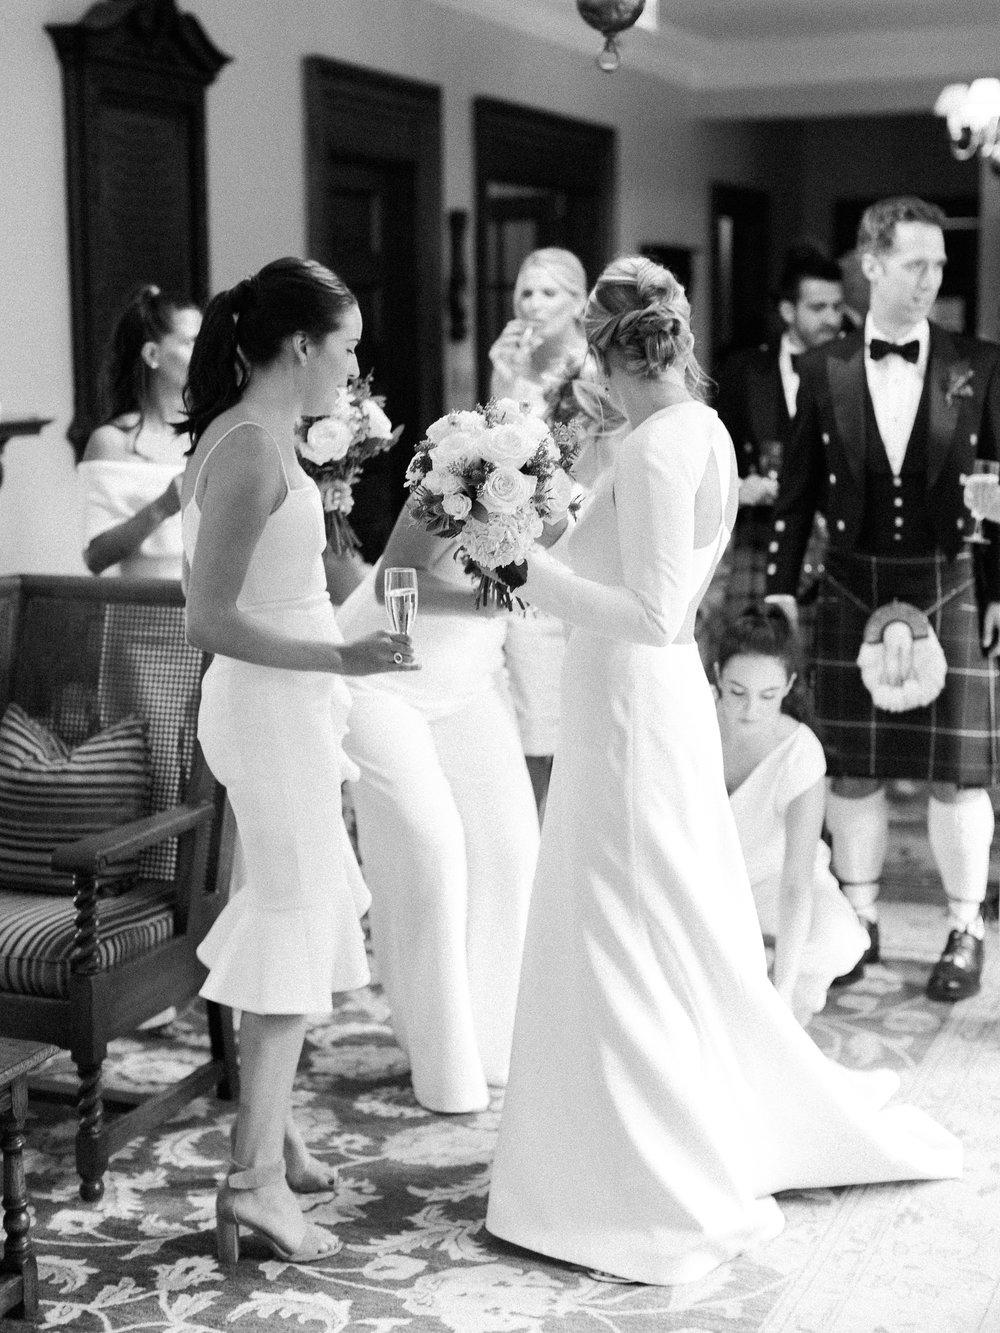 0524-Geneva-Ian-Wedding-Toronto Golf Club-When He Found Her-TorontoPhotographer.jpg